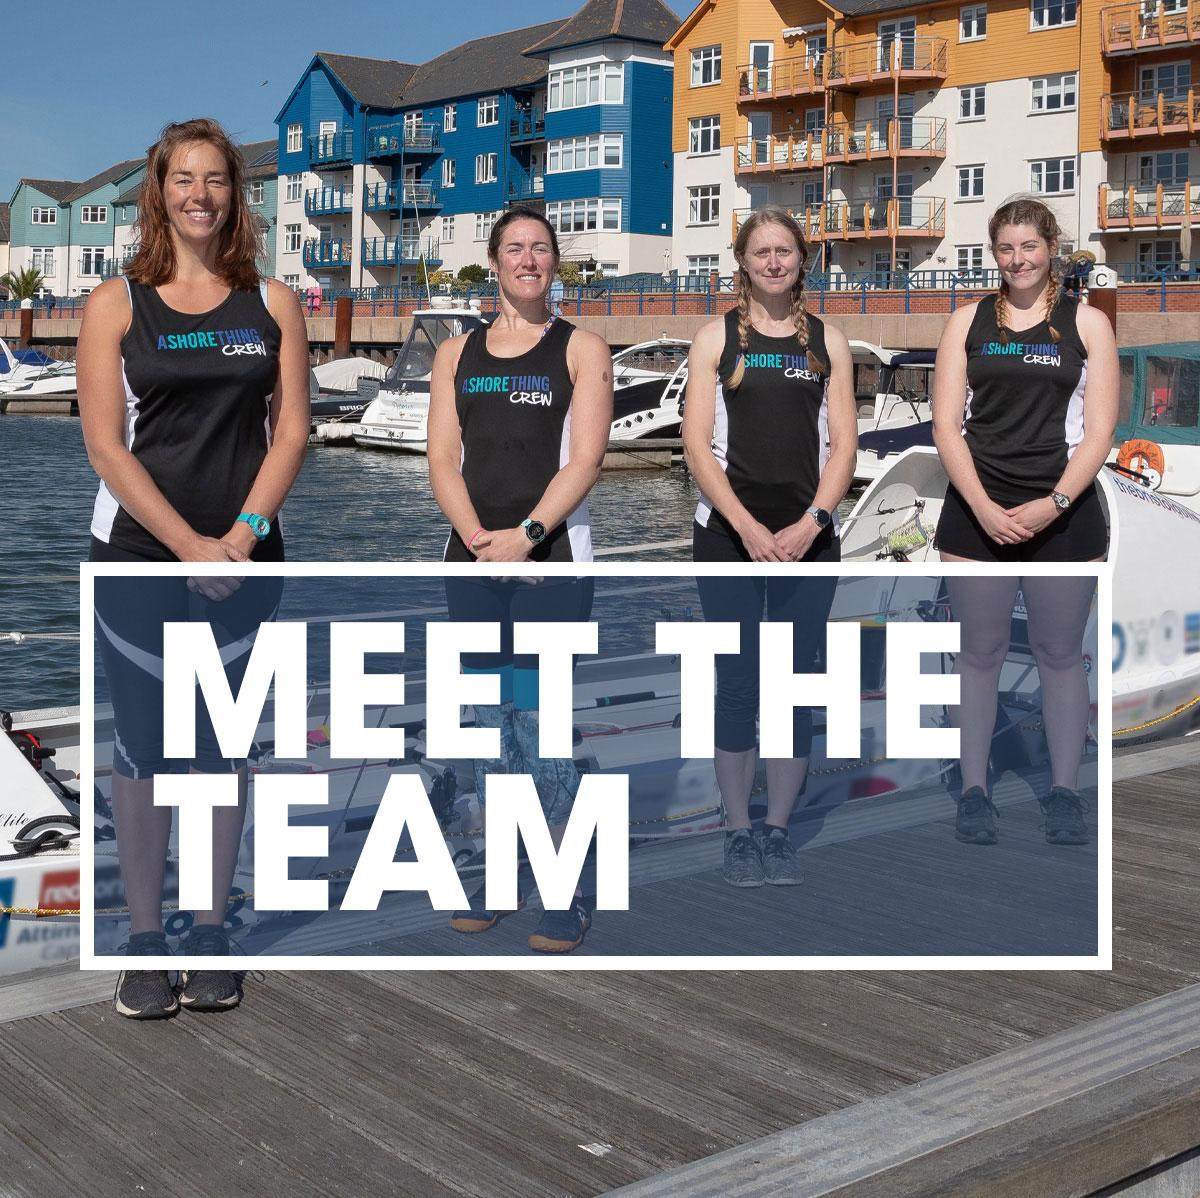 meet-the-team-1200a